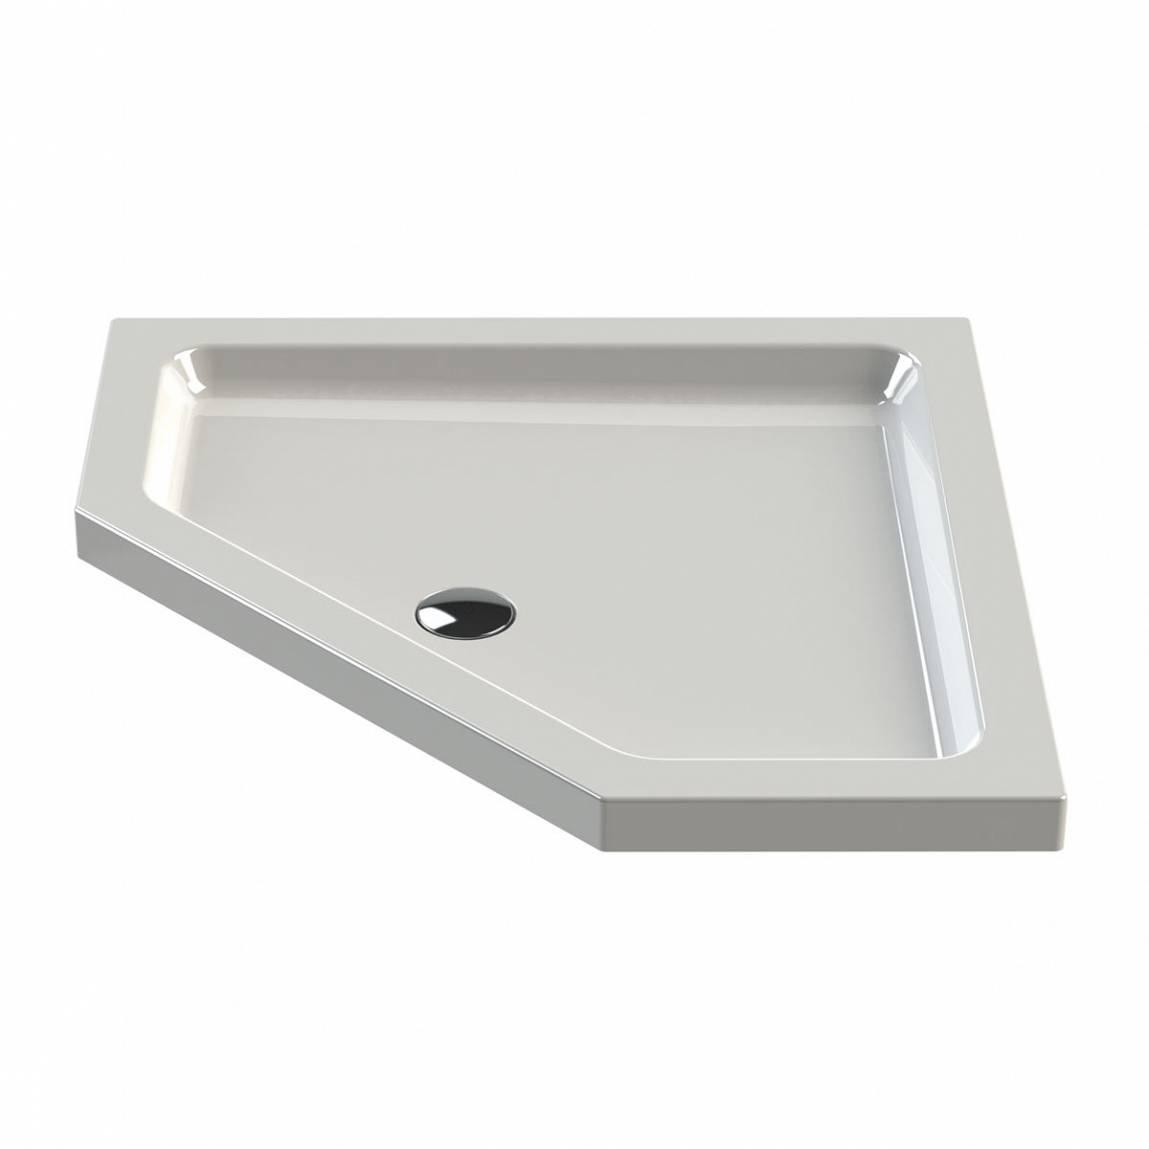 Image of Pentagonal Stone Shower Tray 900 x 900